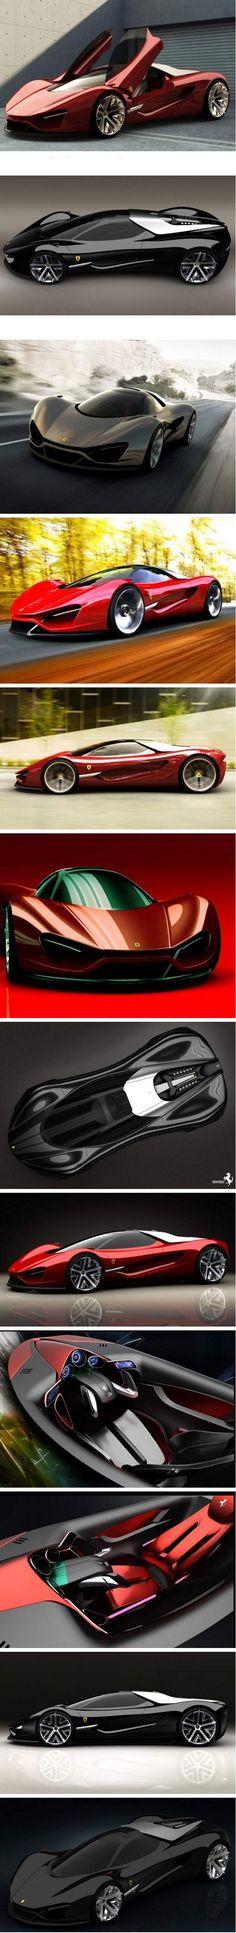 Ferrari Xezri concept - https://www.luxury.guugles.com/ferrari-xezri-concept/